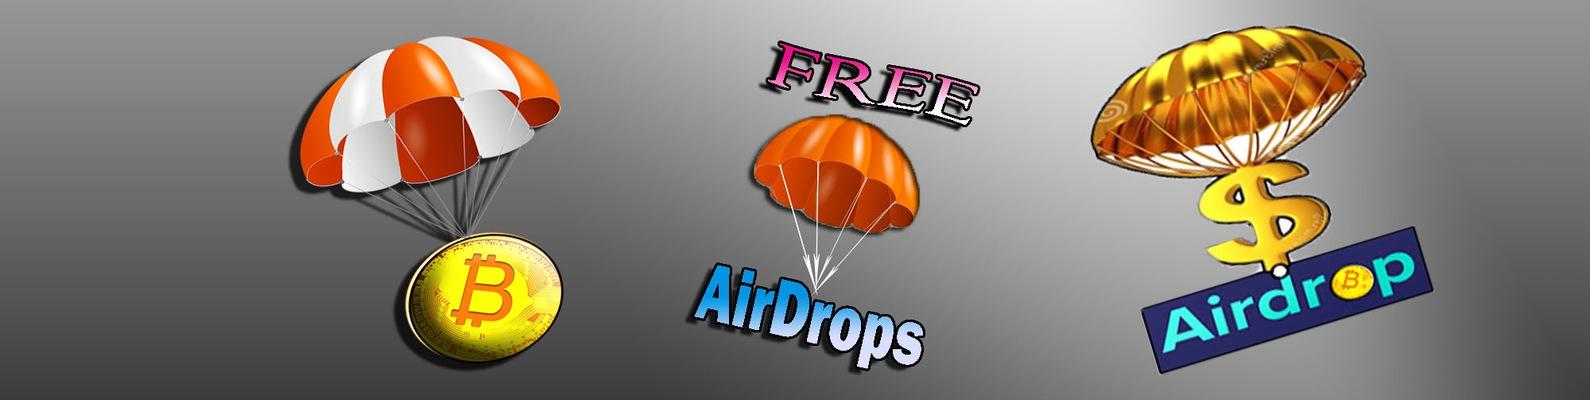 airdrops - official | ВКонтакте